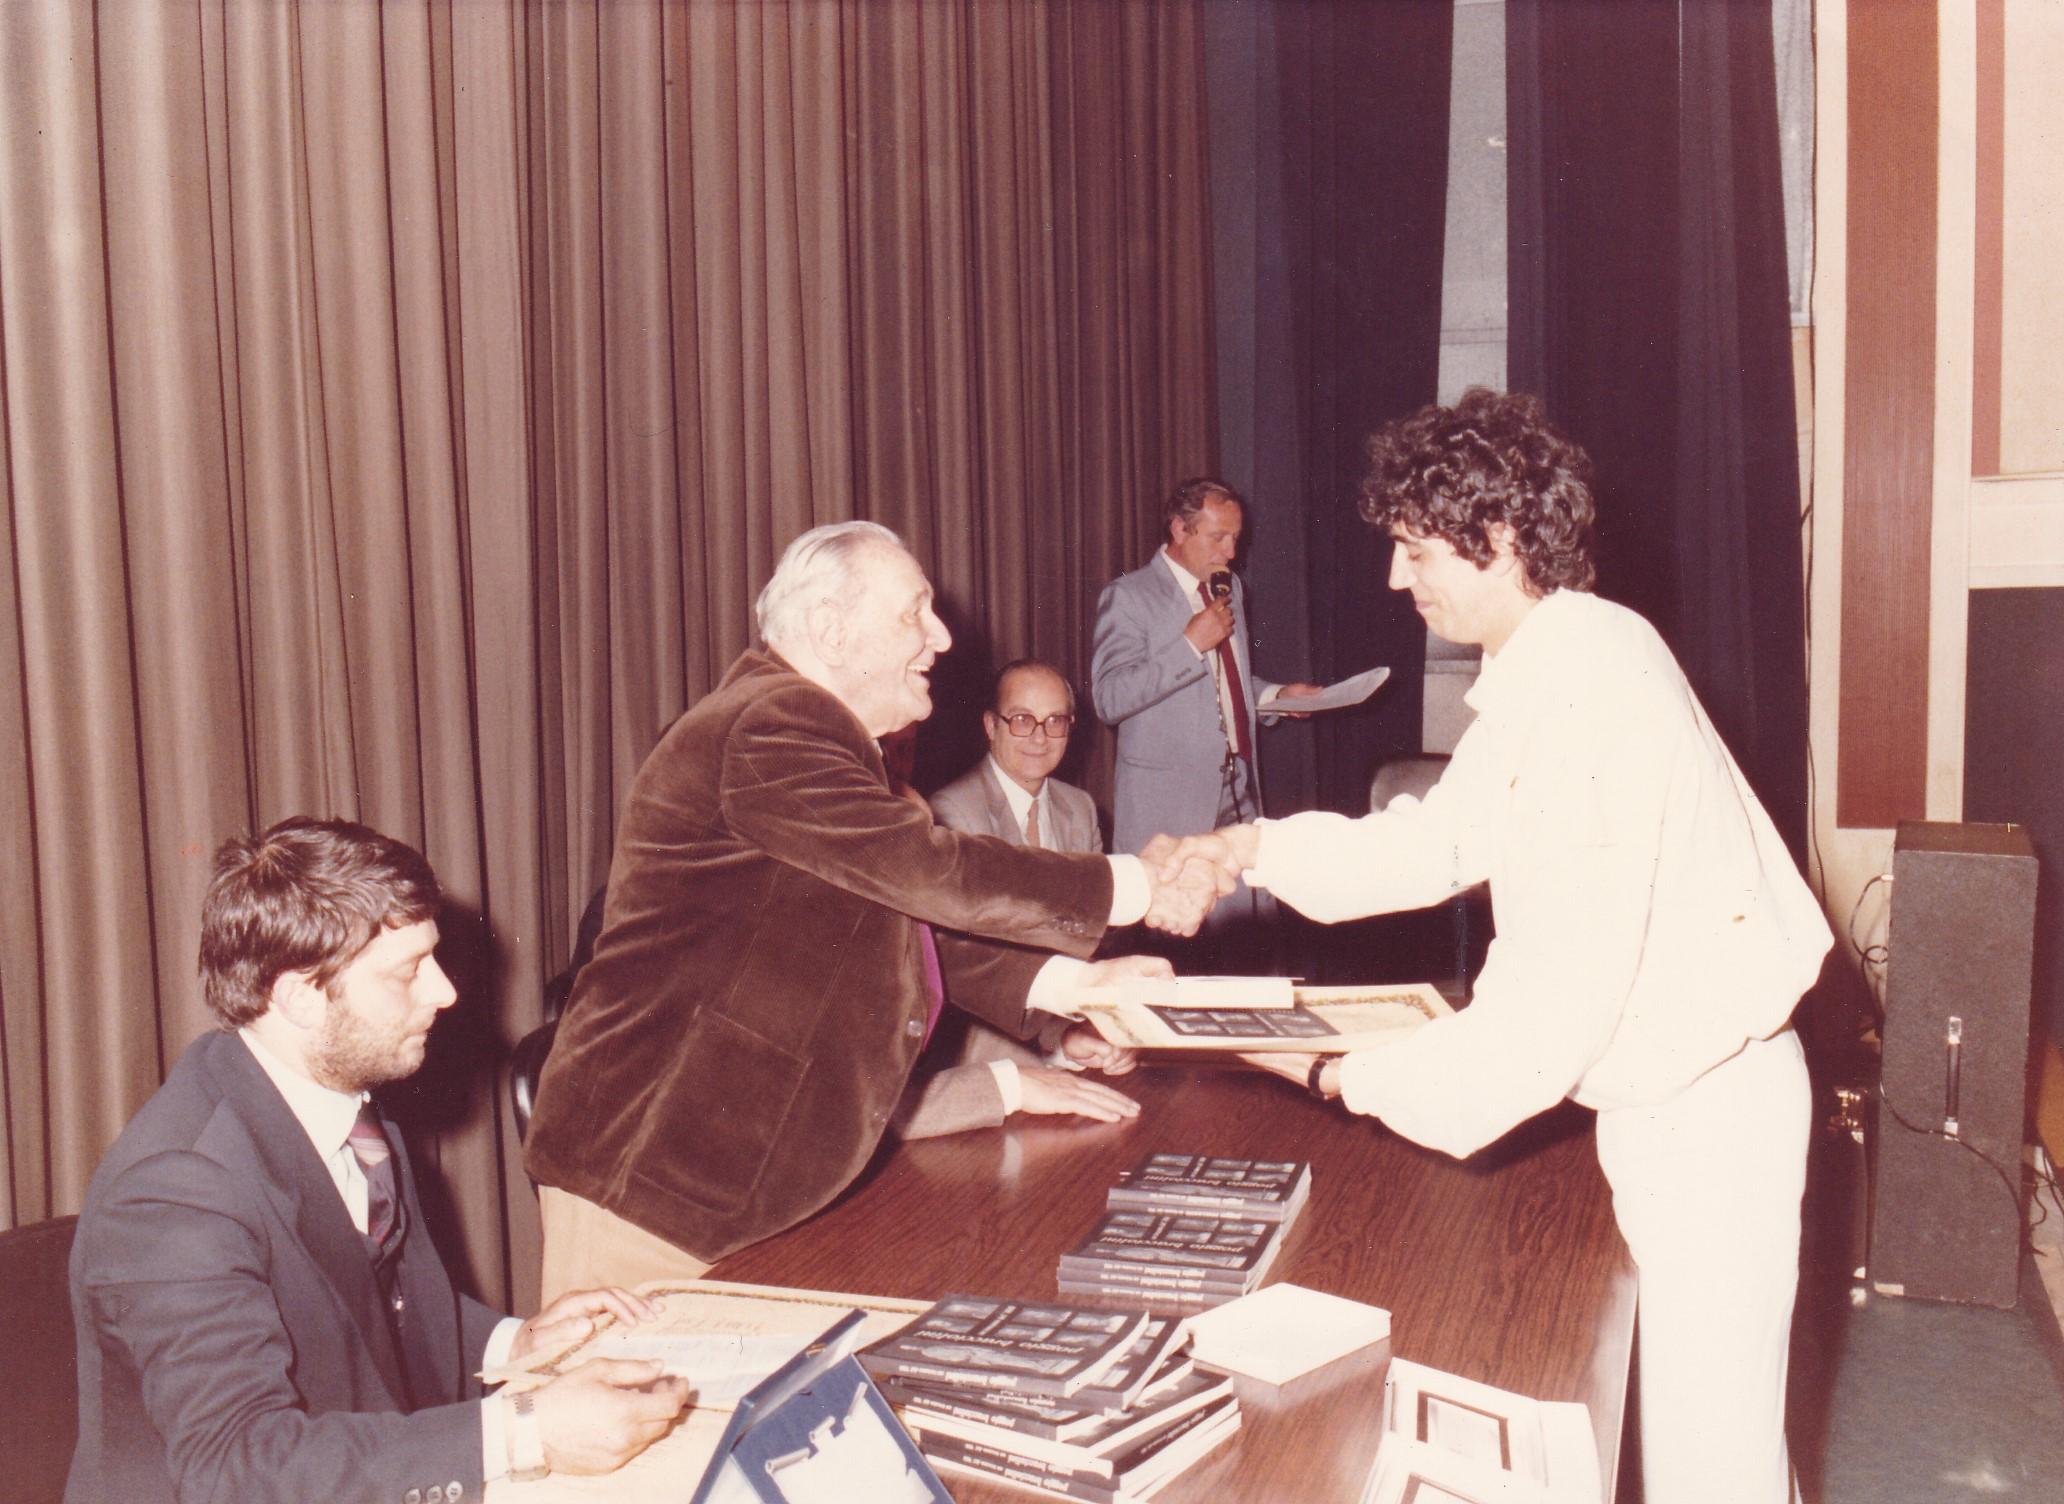 Fernando - Arrigo Tassinari - Terranuova Bracciolini - 1984 - 22 anni